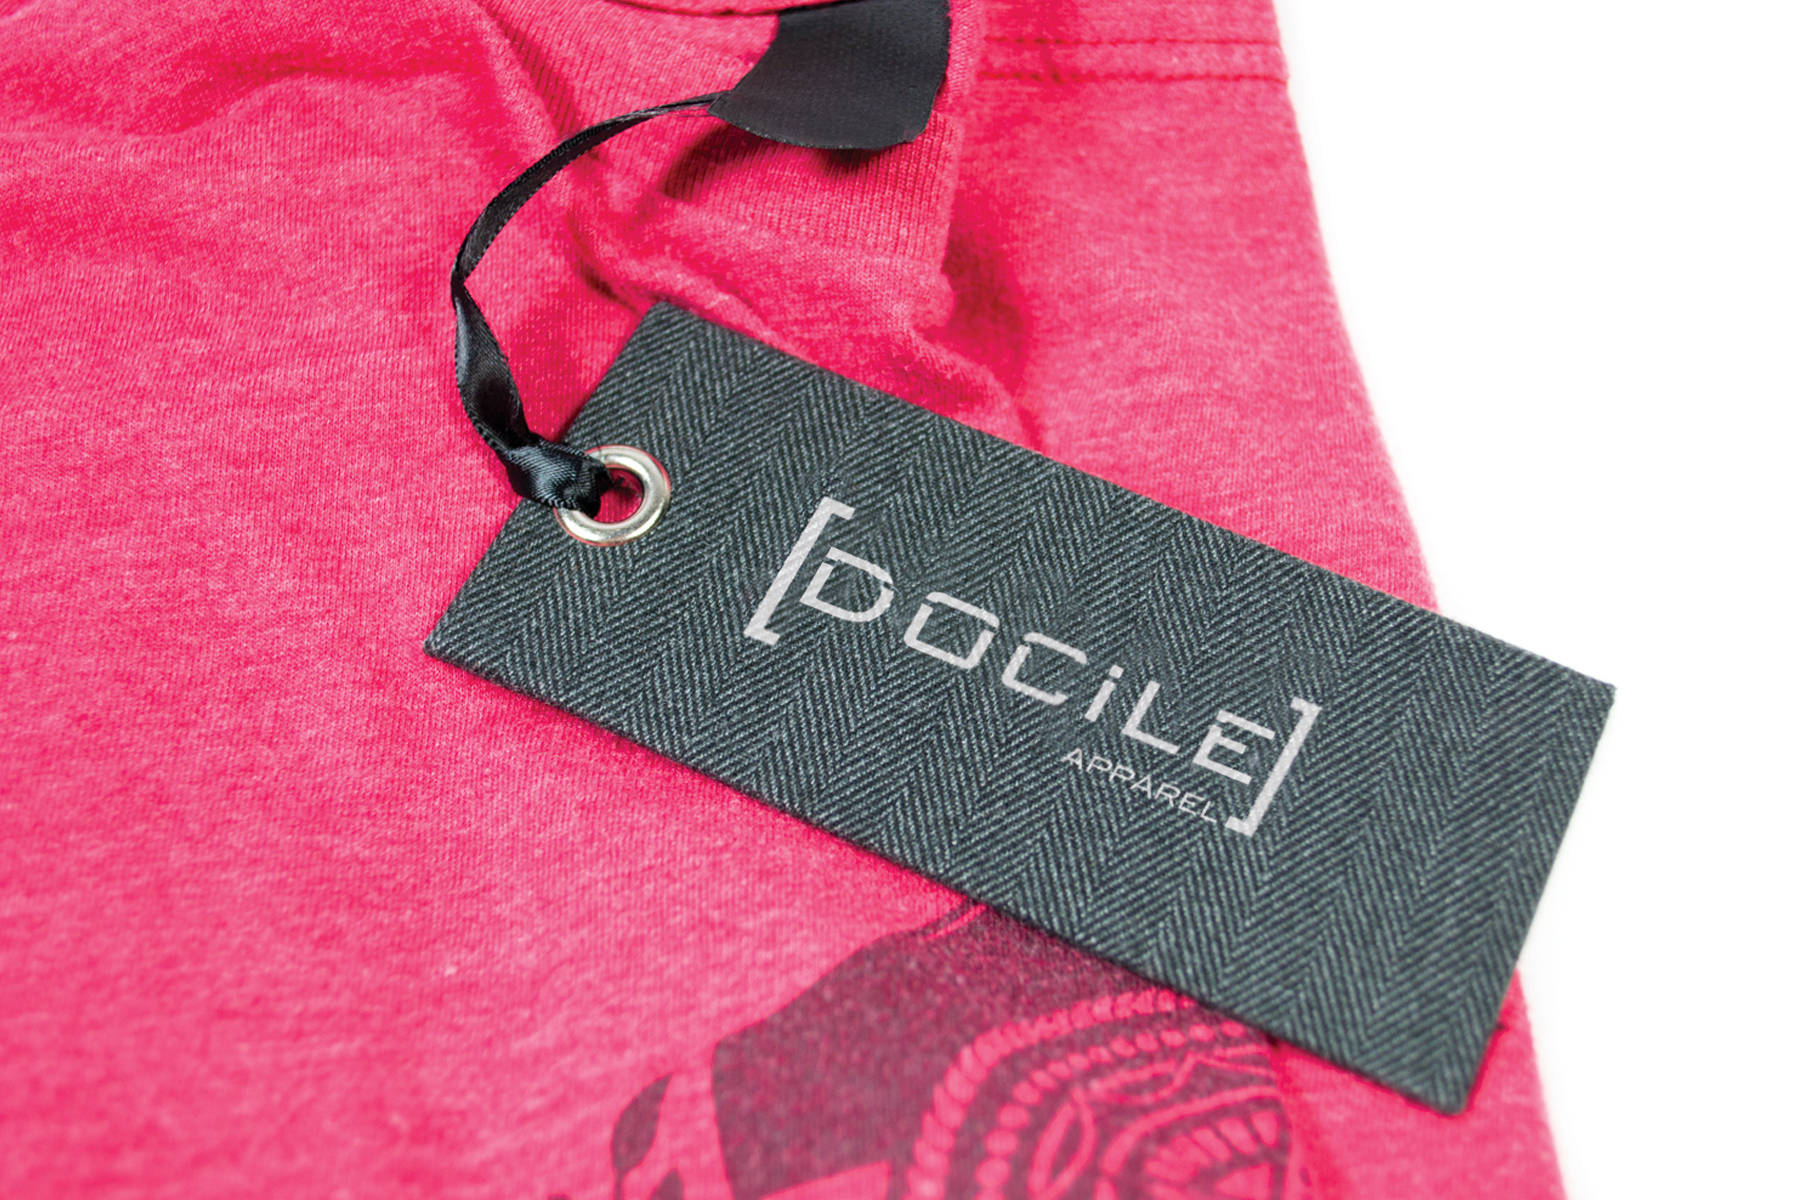 DOCILE_5.jpg